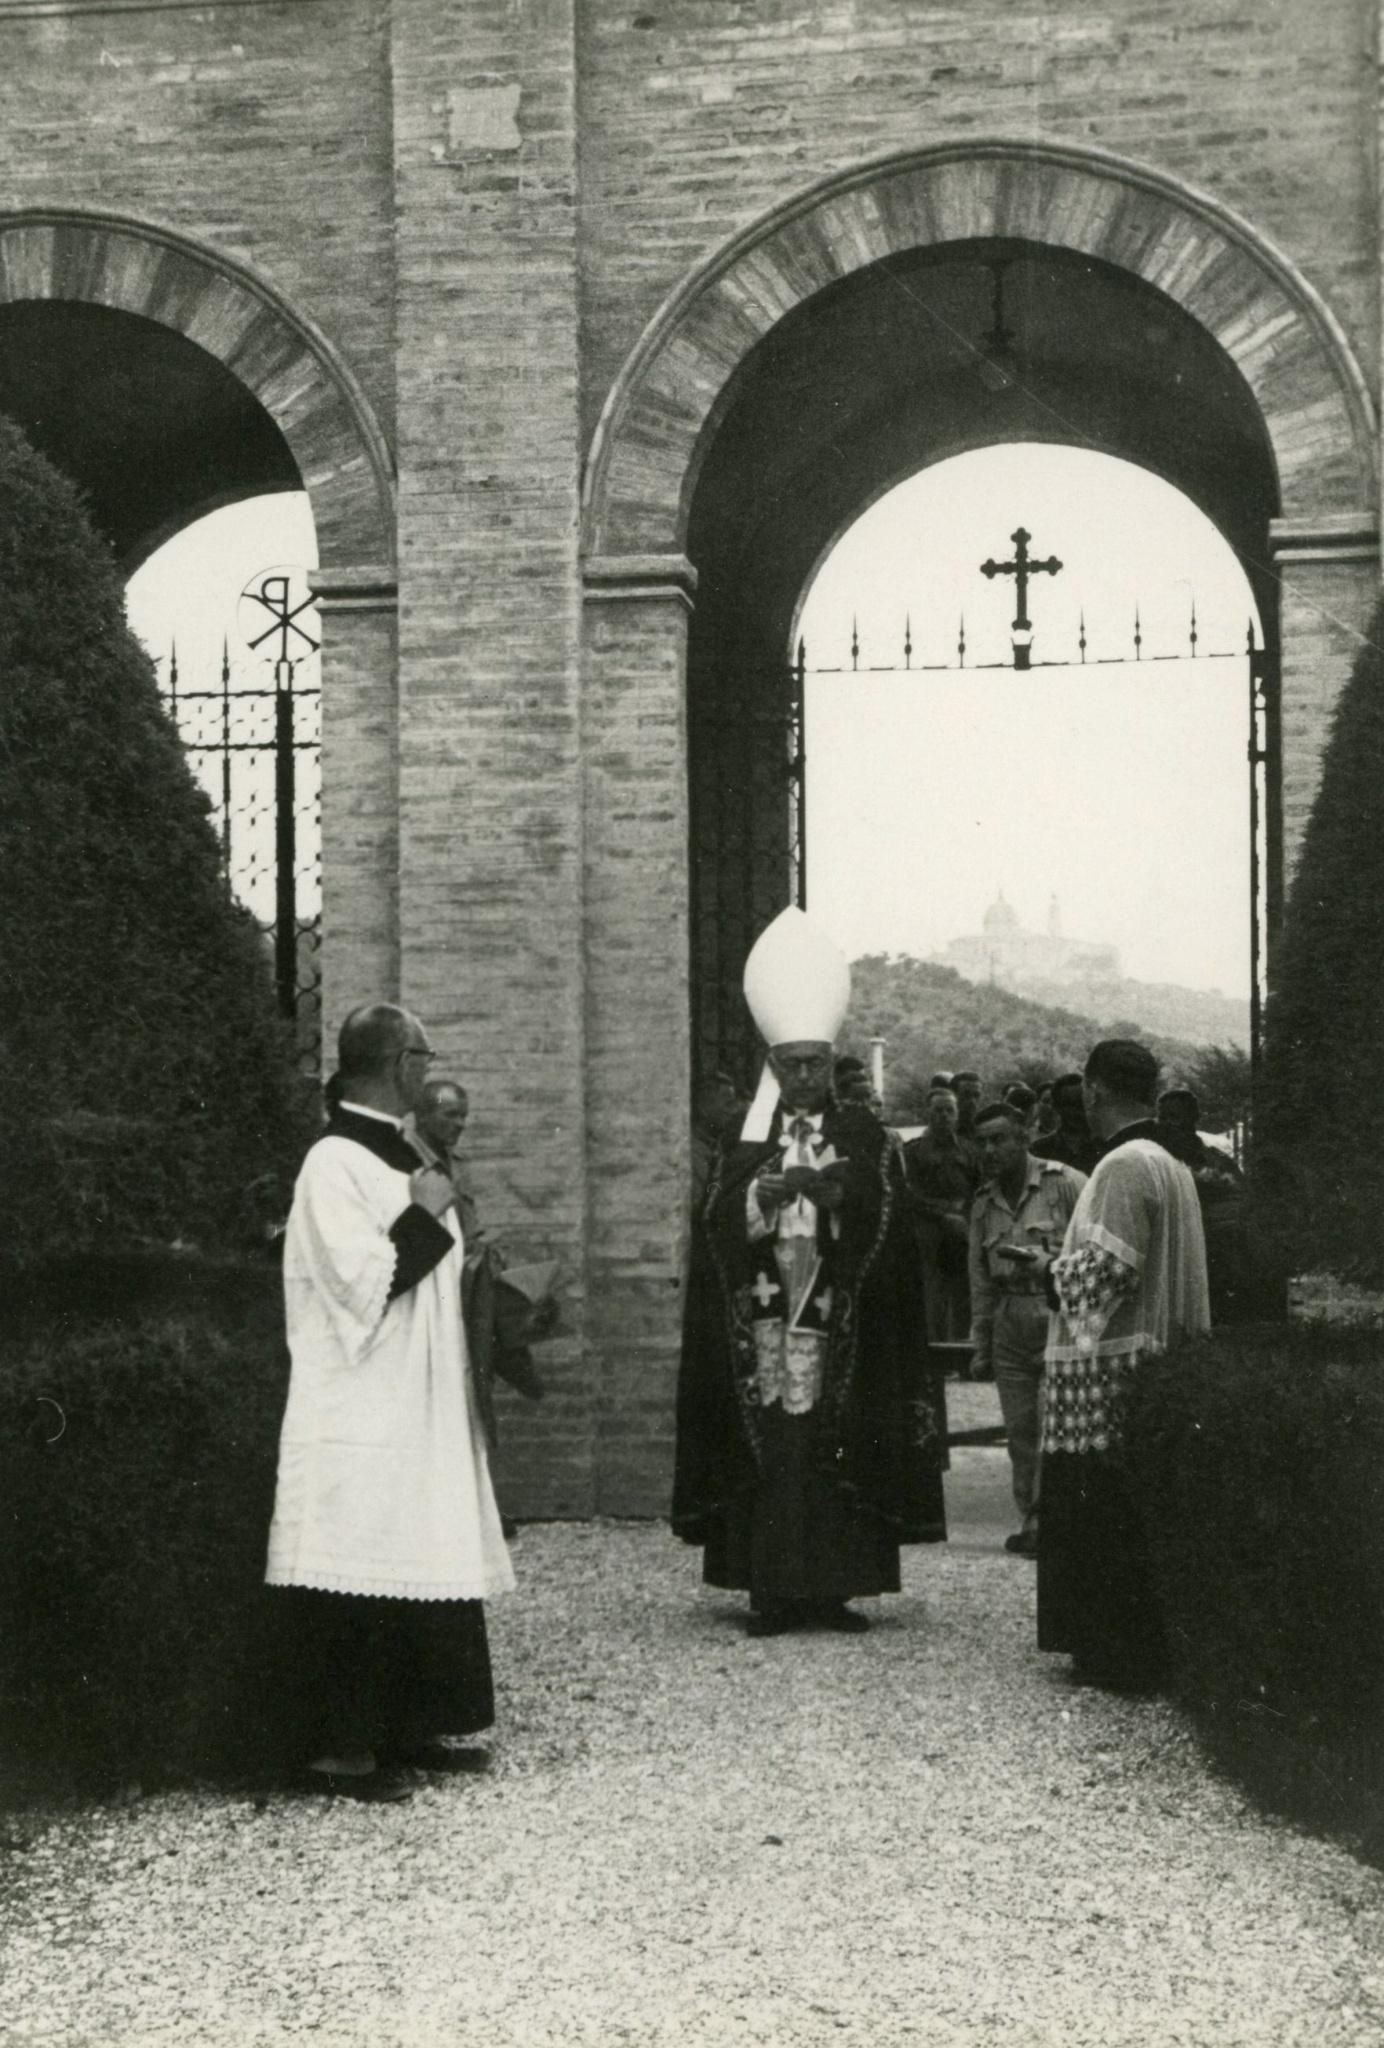 <div class='inner-box'><div class='close-desc'></div><span class='opis'>Ks. biskup Gawlina podczas pogrzebu Adolfa Bocheńskiego, Loreto, 1944.</span><div class='clearfix'></div><span>Archive ref. FIL00102</span><div class='clearfix'></div><span>© Instytut Literacki</span></div>